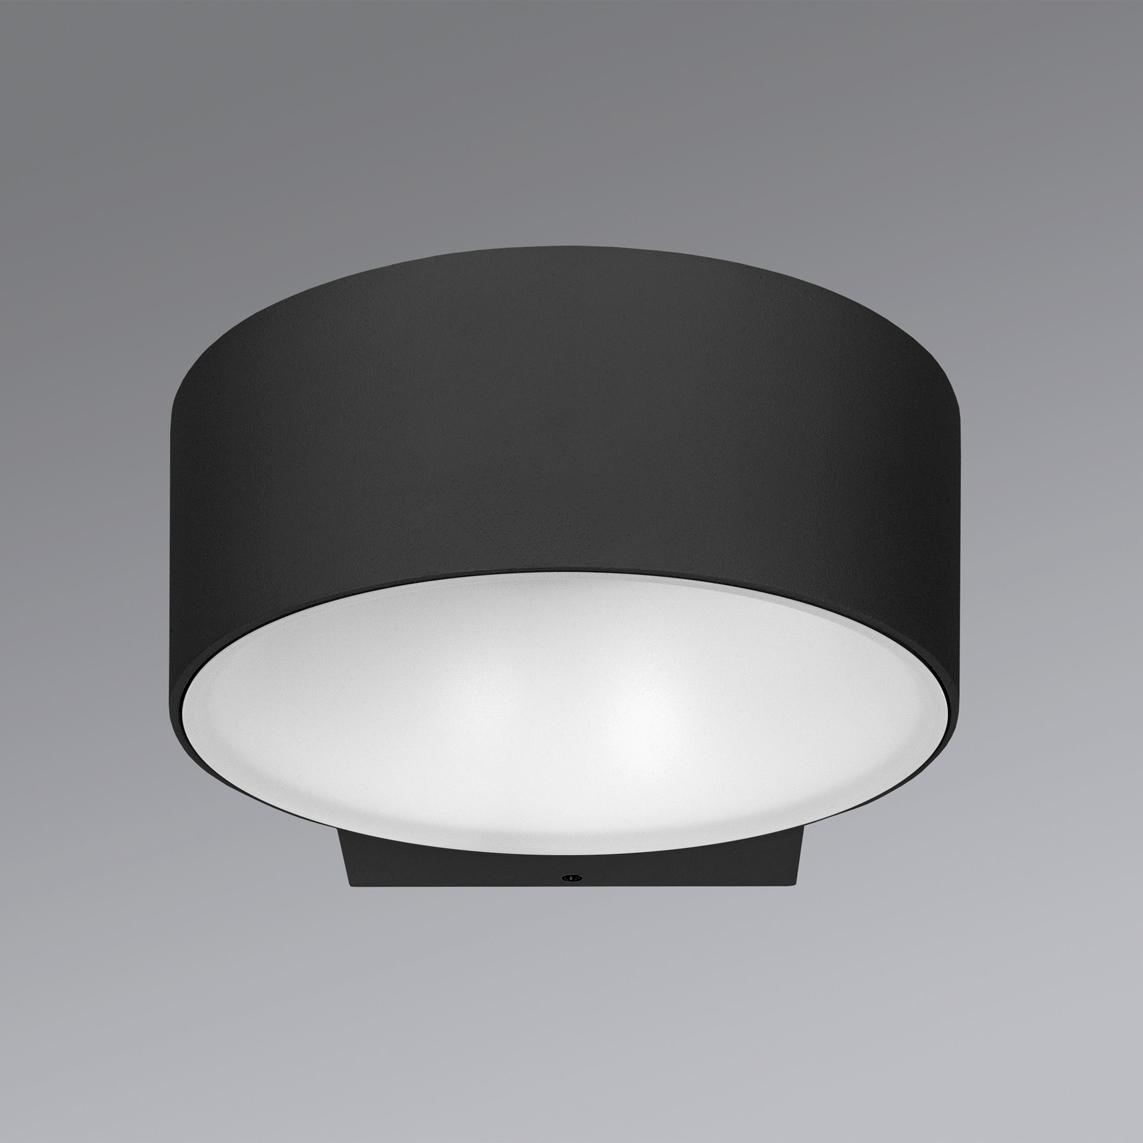 WL 140 - LED Aussenleuchte antrazith